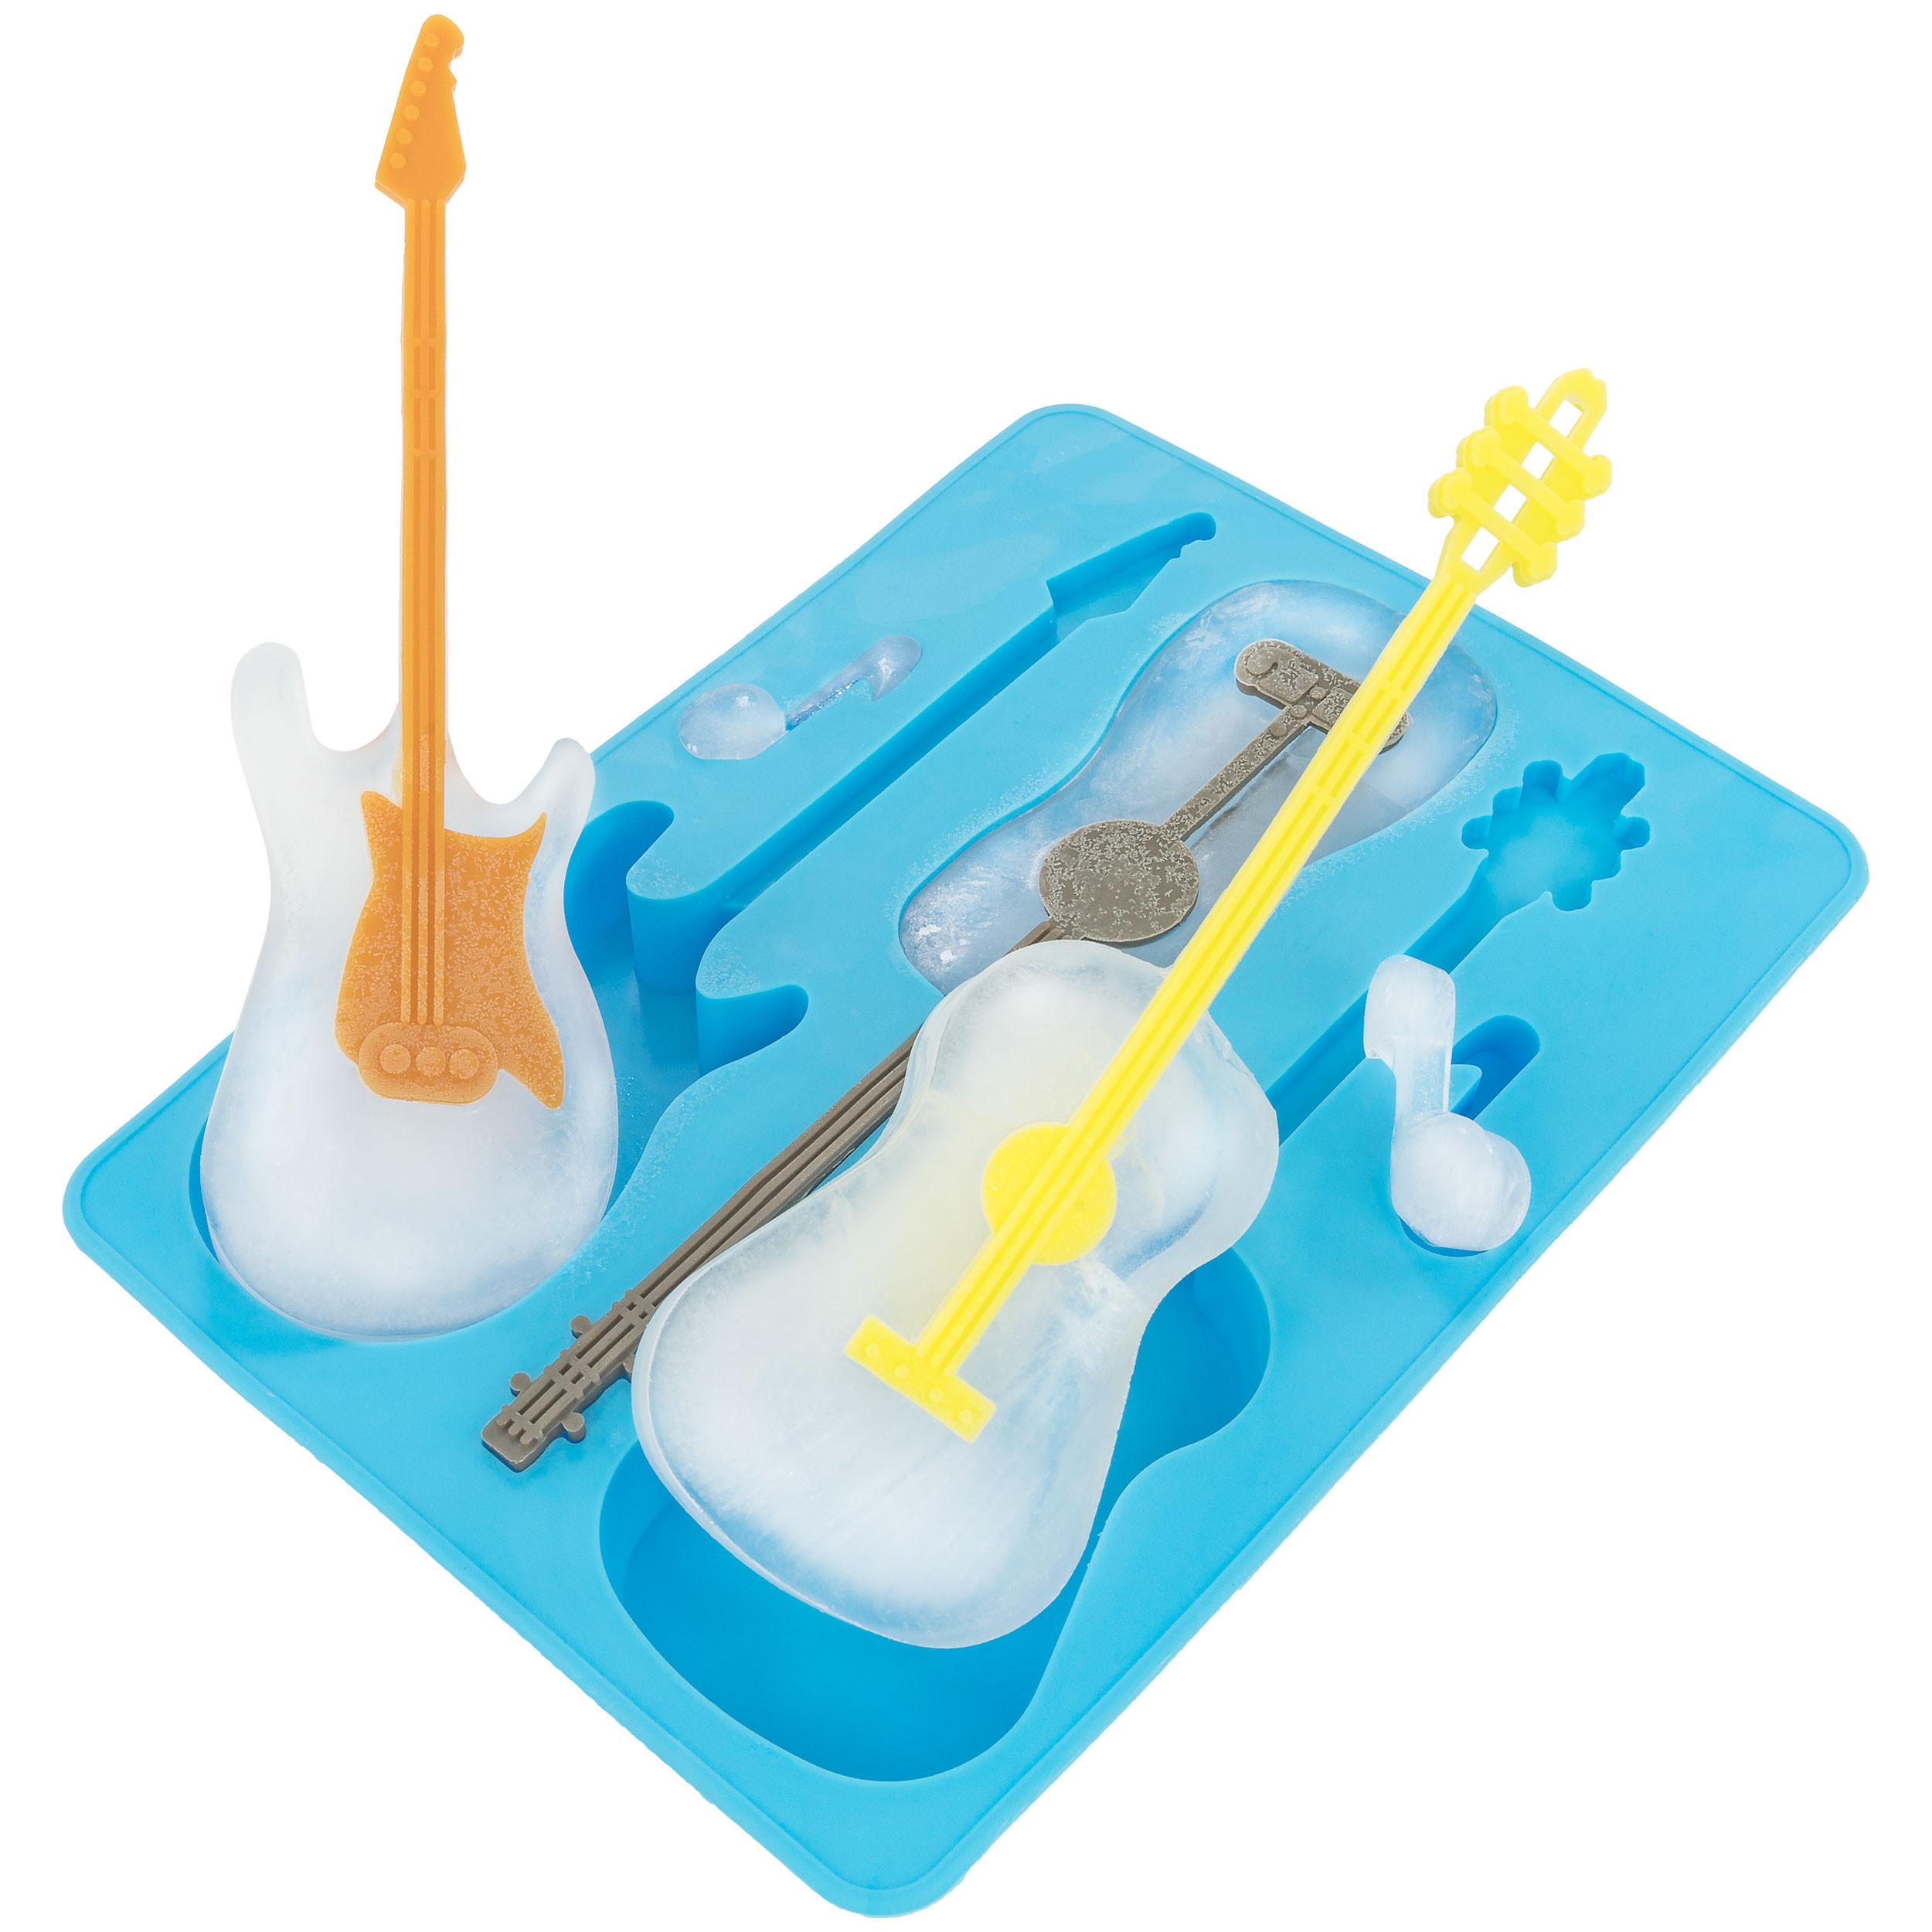 Guitar Ice Cube Tray